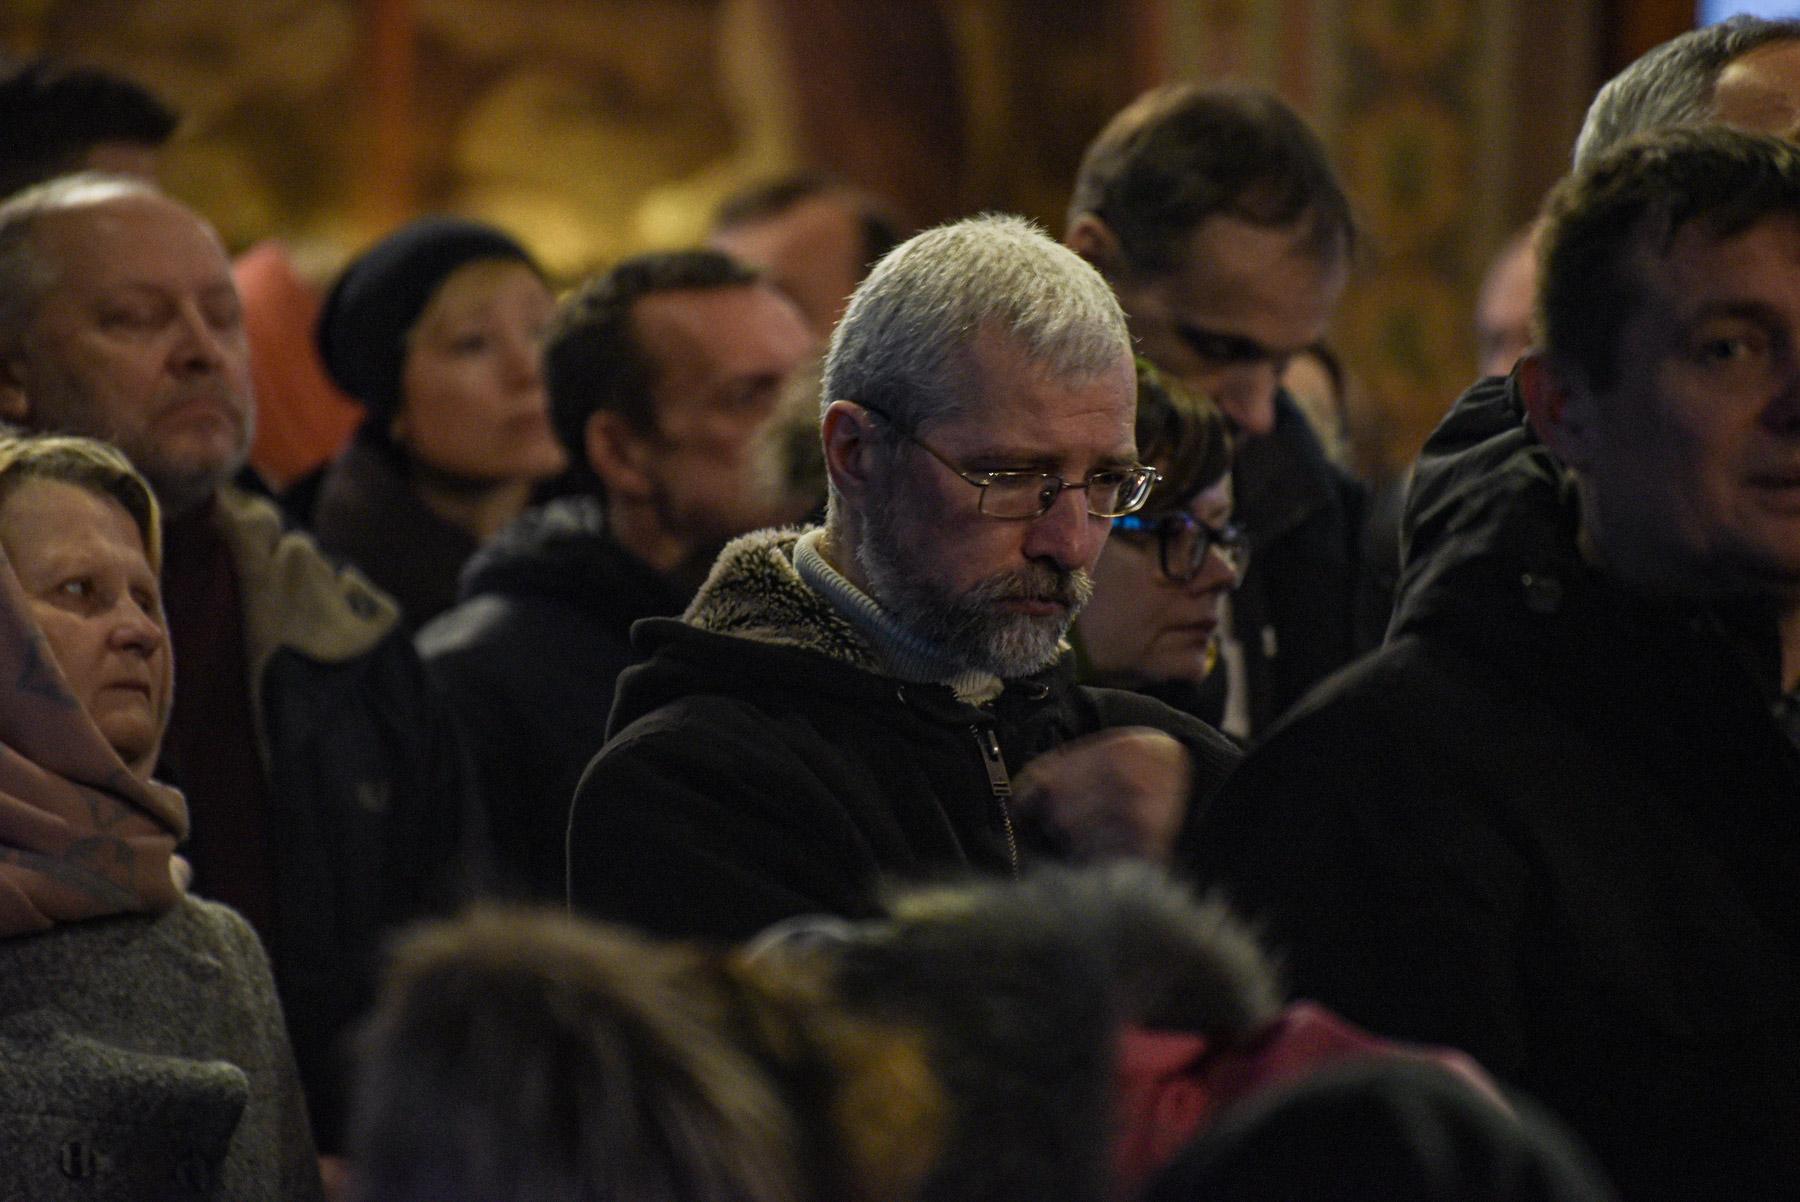 photos of orthodox christmas 0235 2